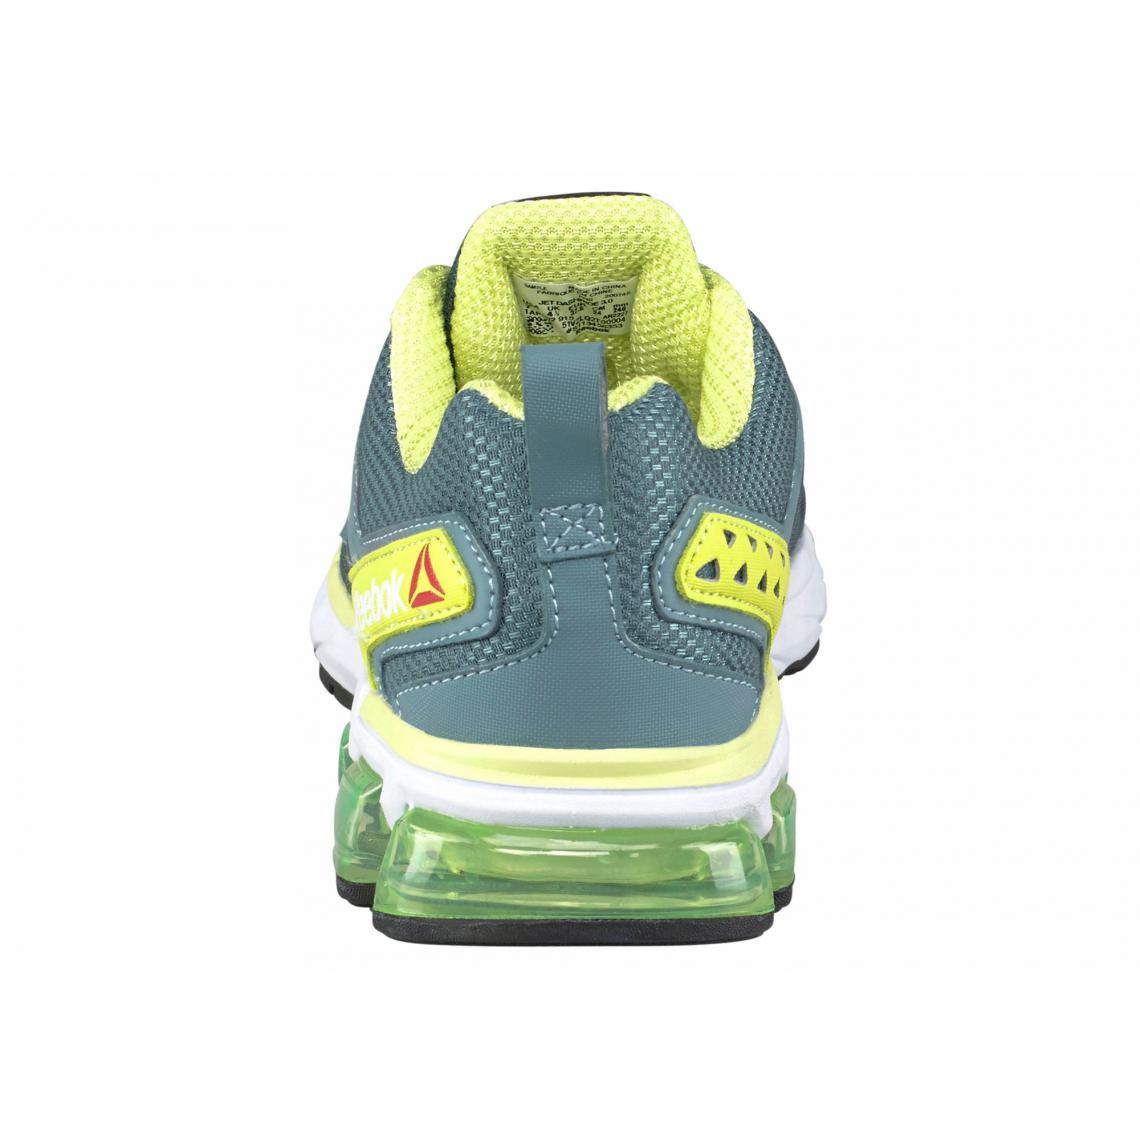 Jet Chaussures Reebok De Jaune3 Running Suisses Homme 0 Dashride 3 XNn8wk0OP